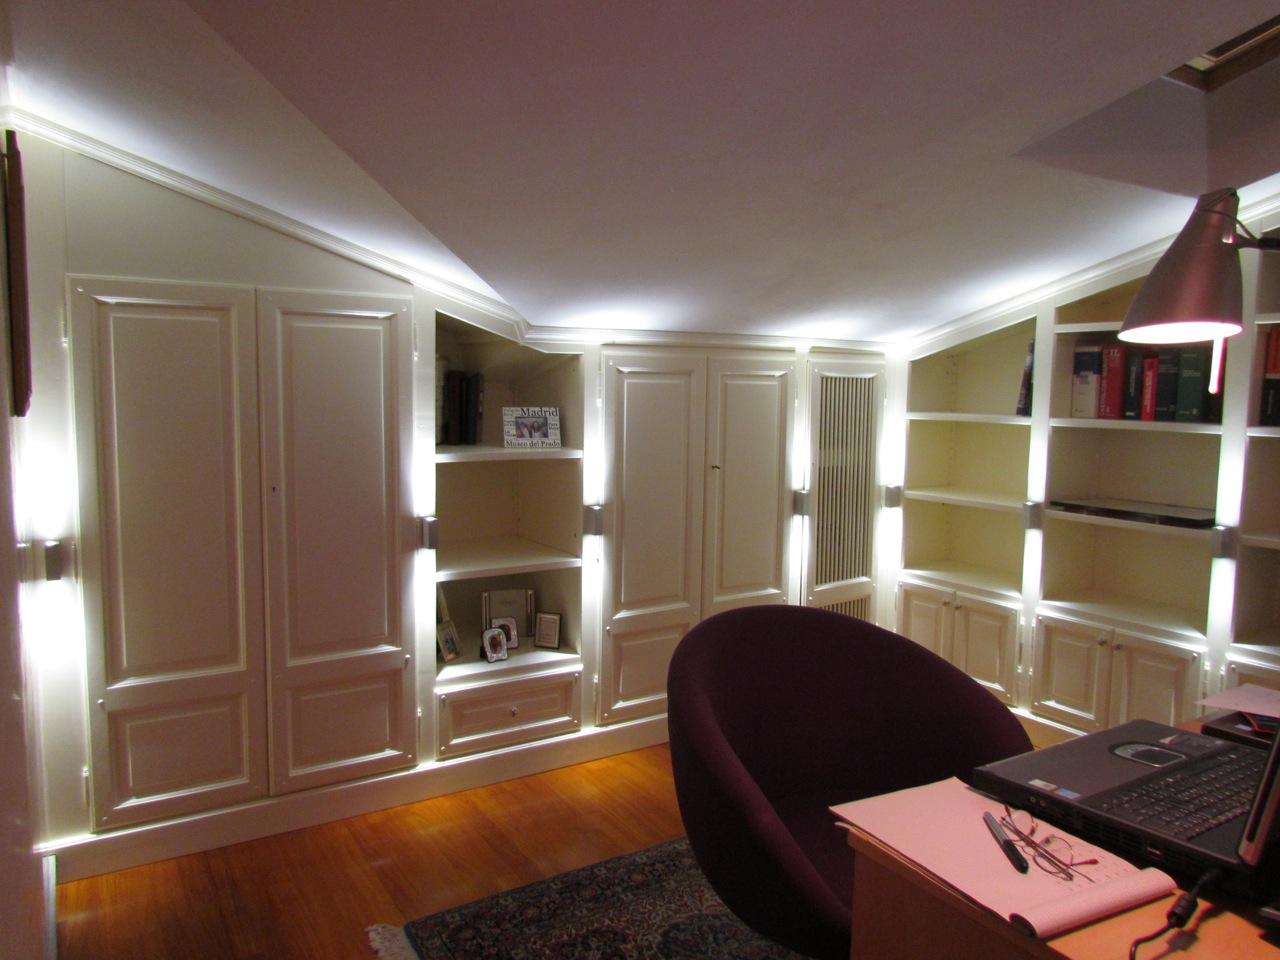 Arredare la mansarda garden house lazzerini for Mansarda in legno bianco